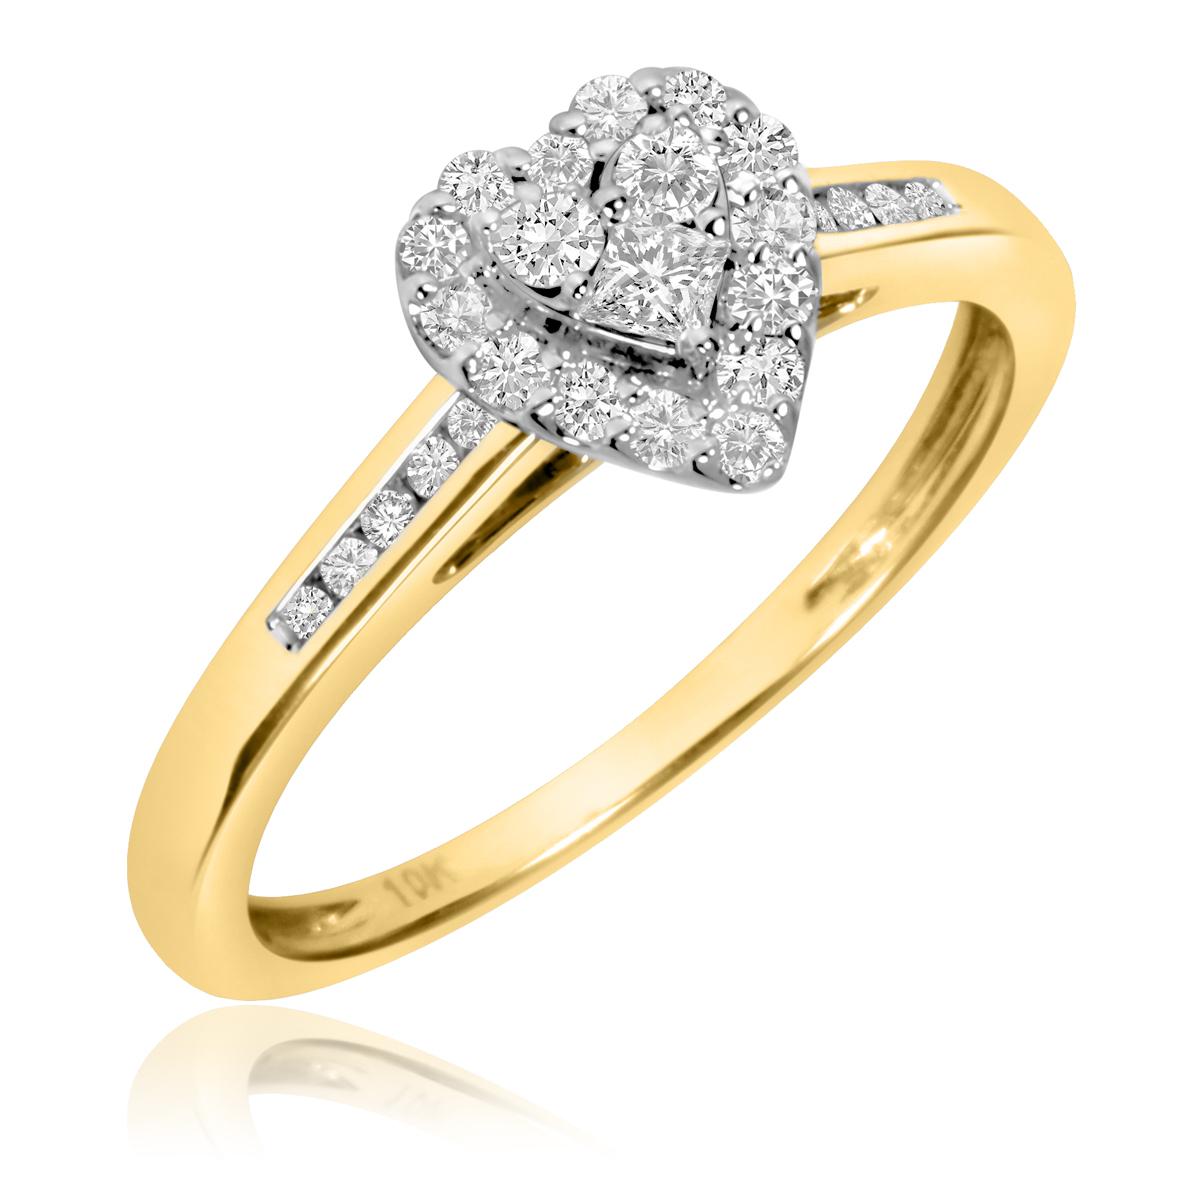 1/3 Carat T.W. Round Cut Diamond Ladies Engagement Ring 10K Yellow Gold- Size 8